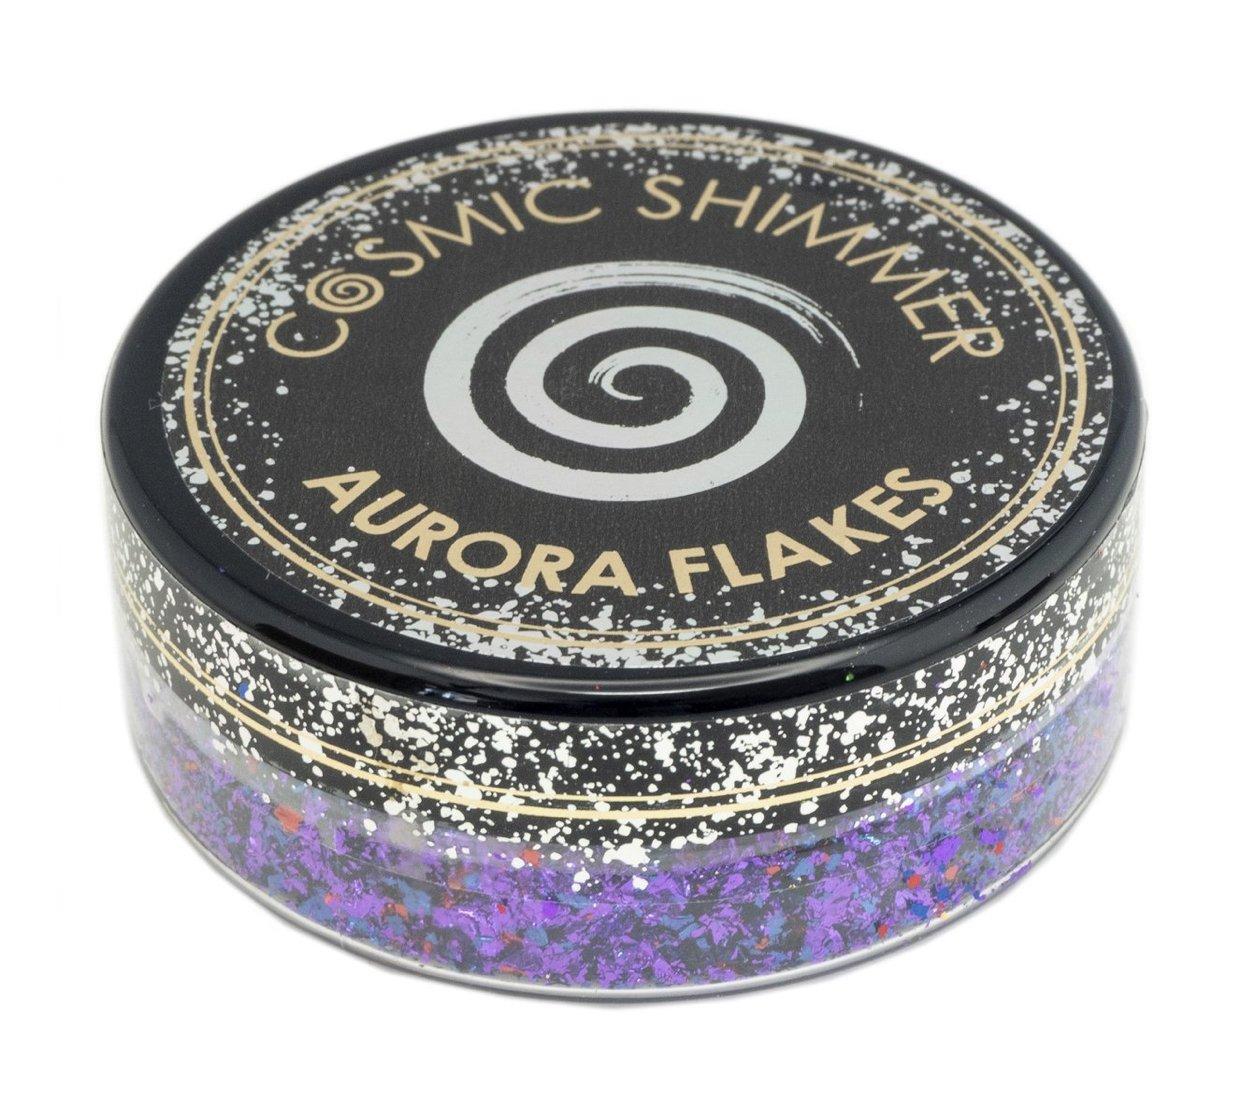 Aurora Flakes- Passion Pop